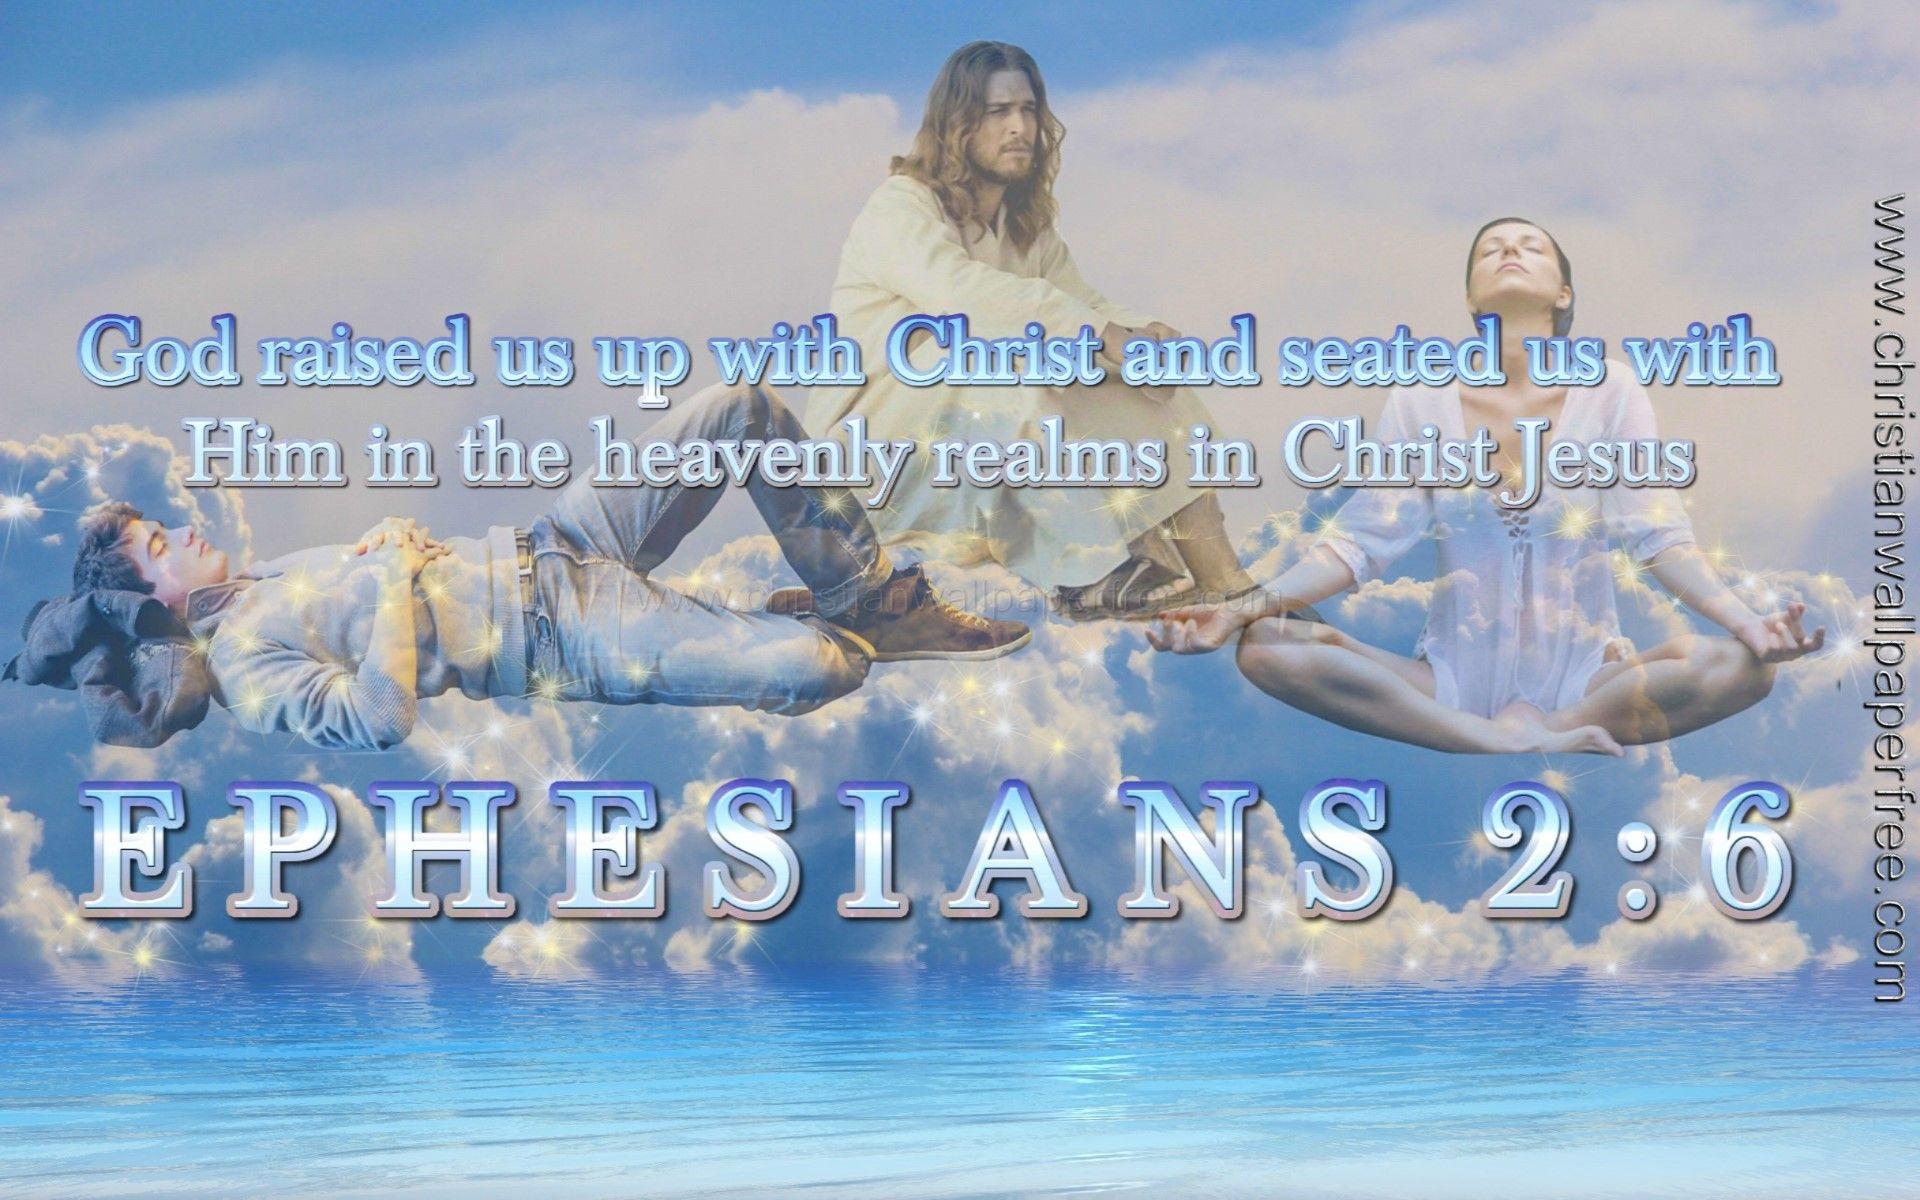 Ephesians 2 Verse 6 A Bin